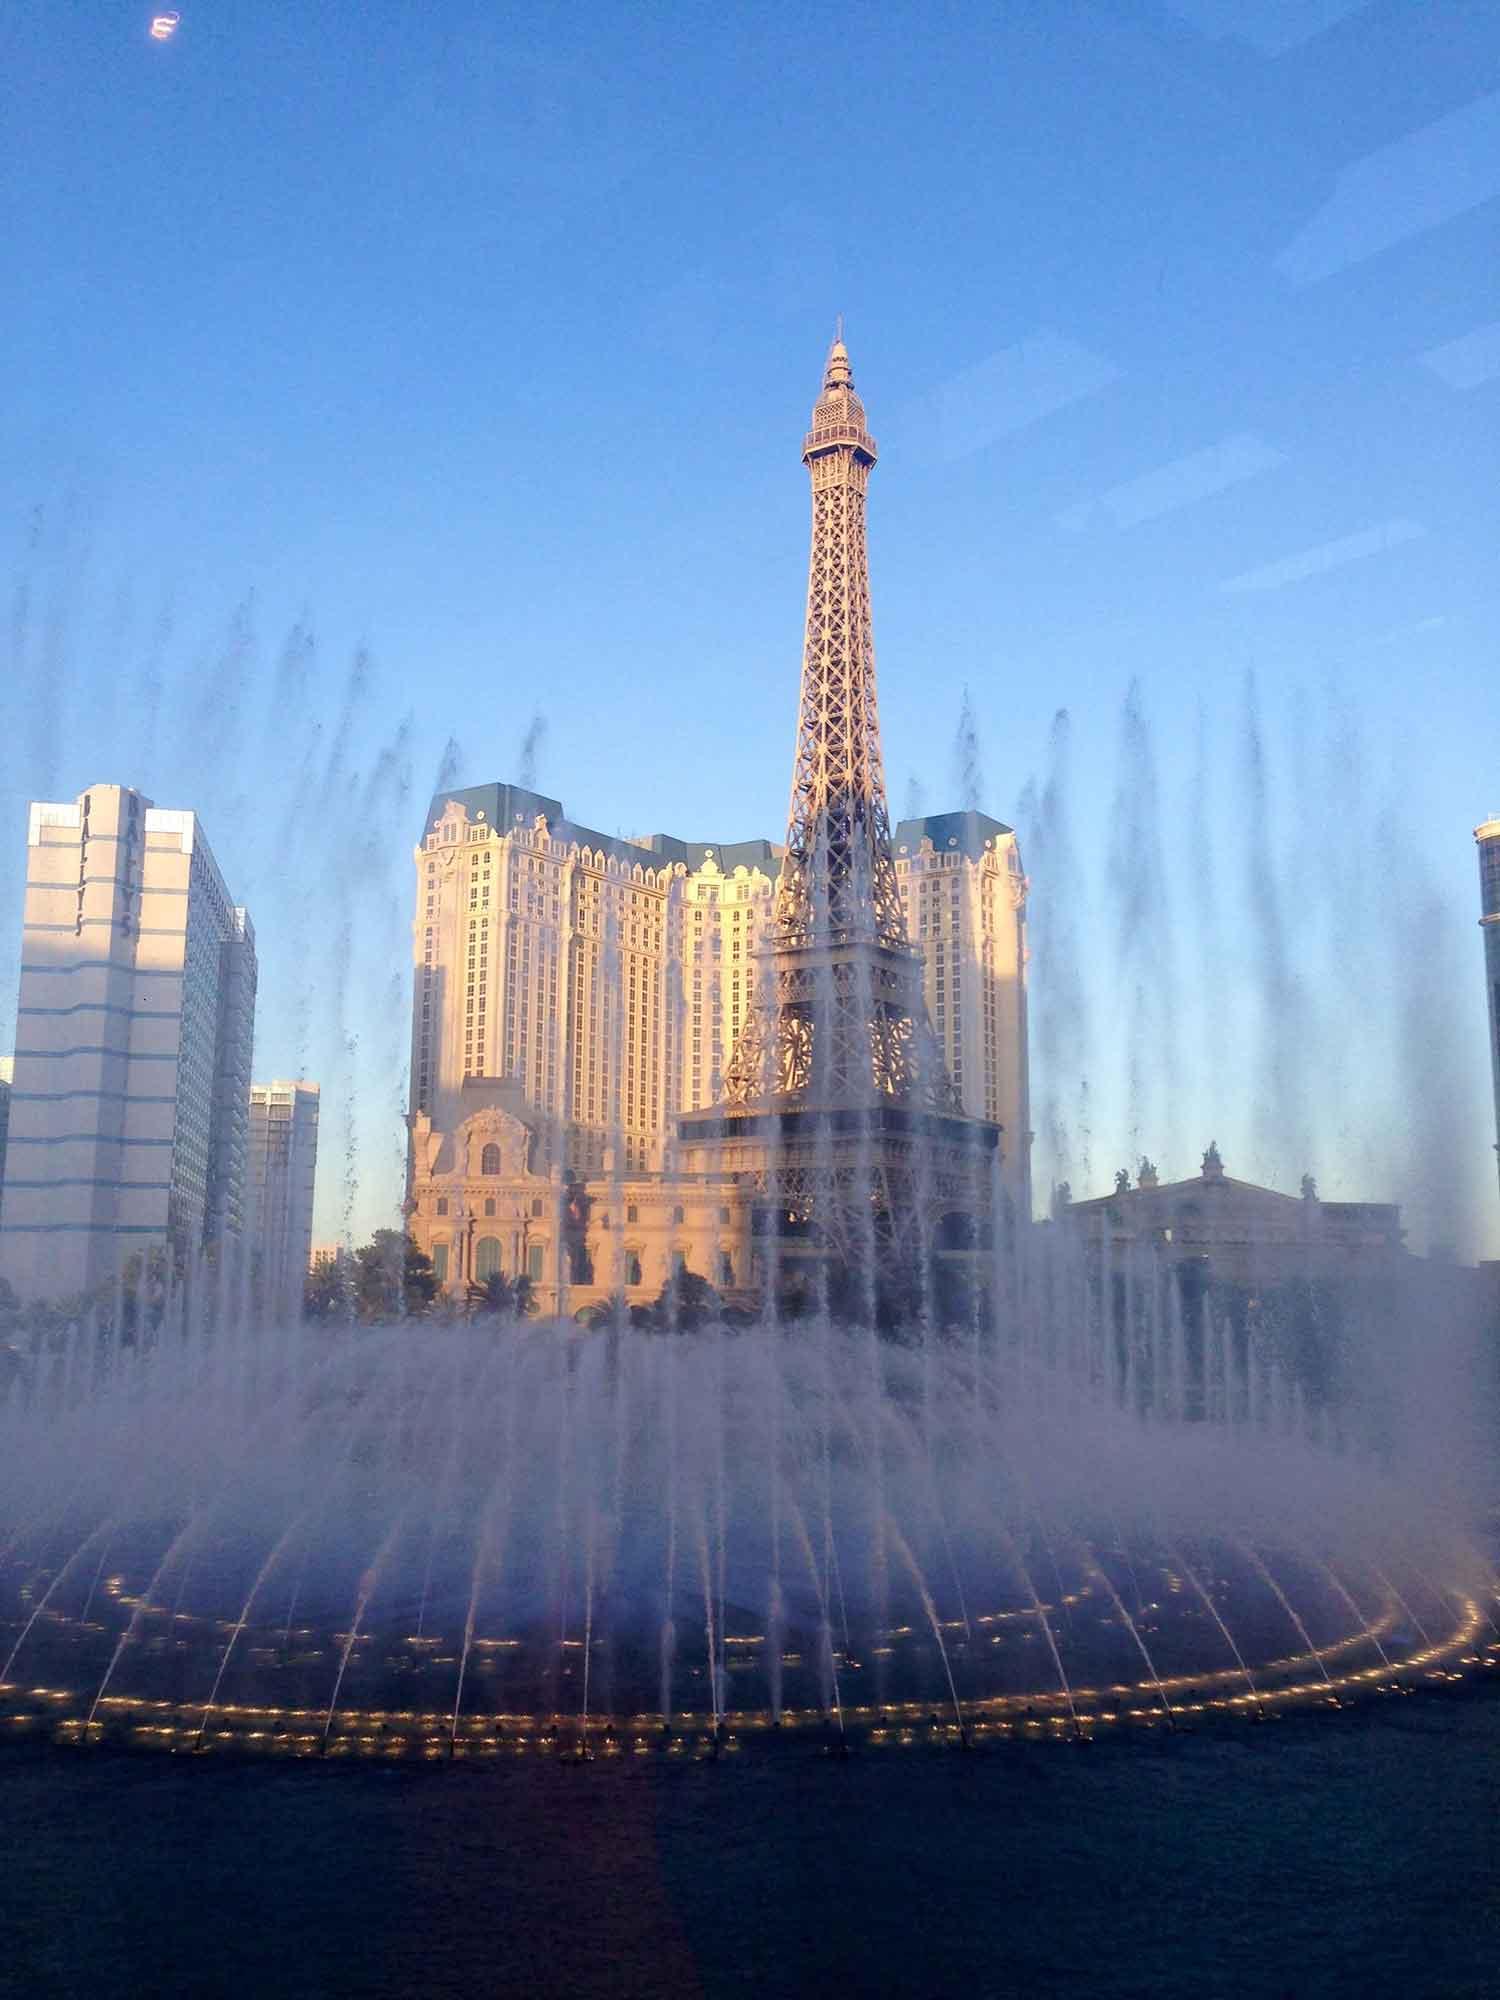 Las Vegas photo Bellagio Fountains from Bellagio Hotel Las Vegas